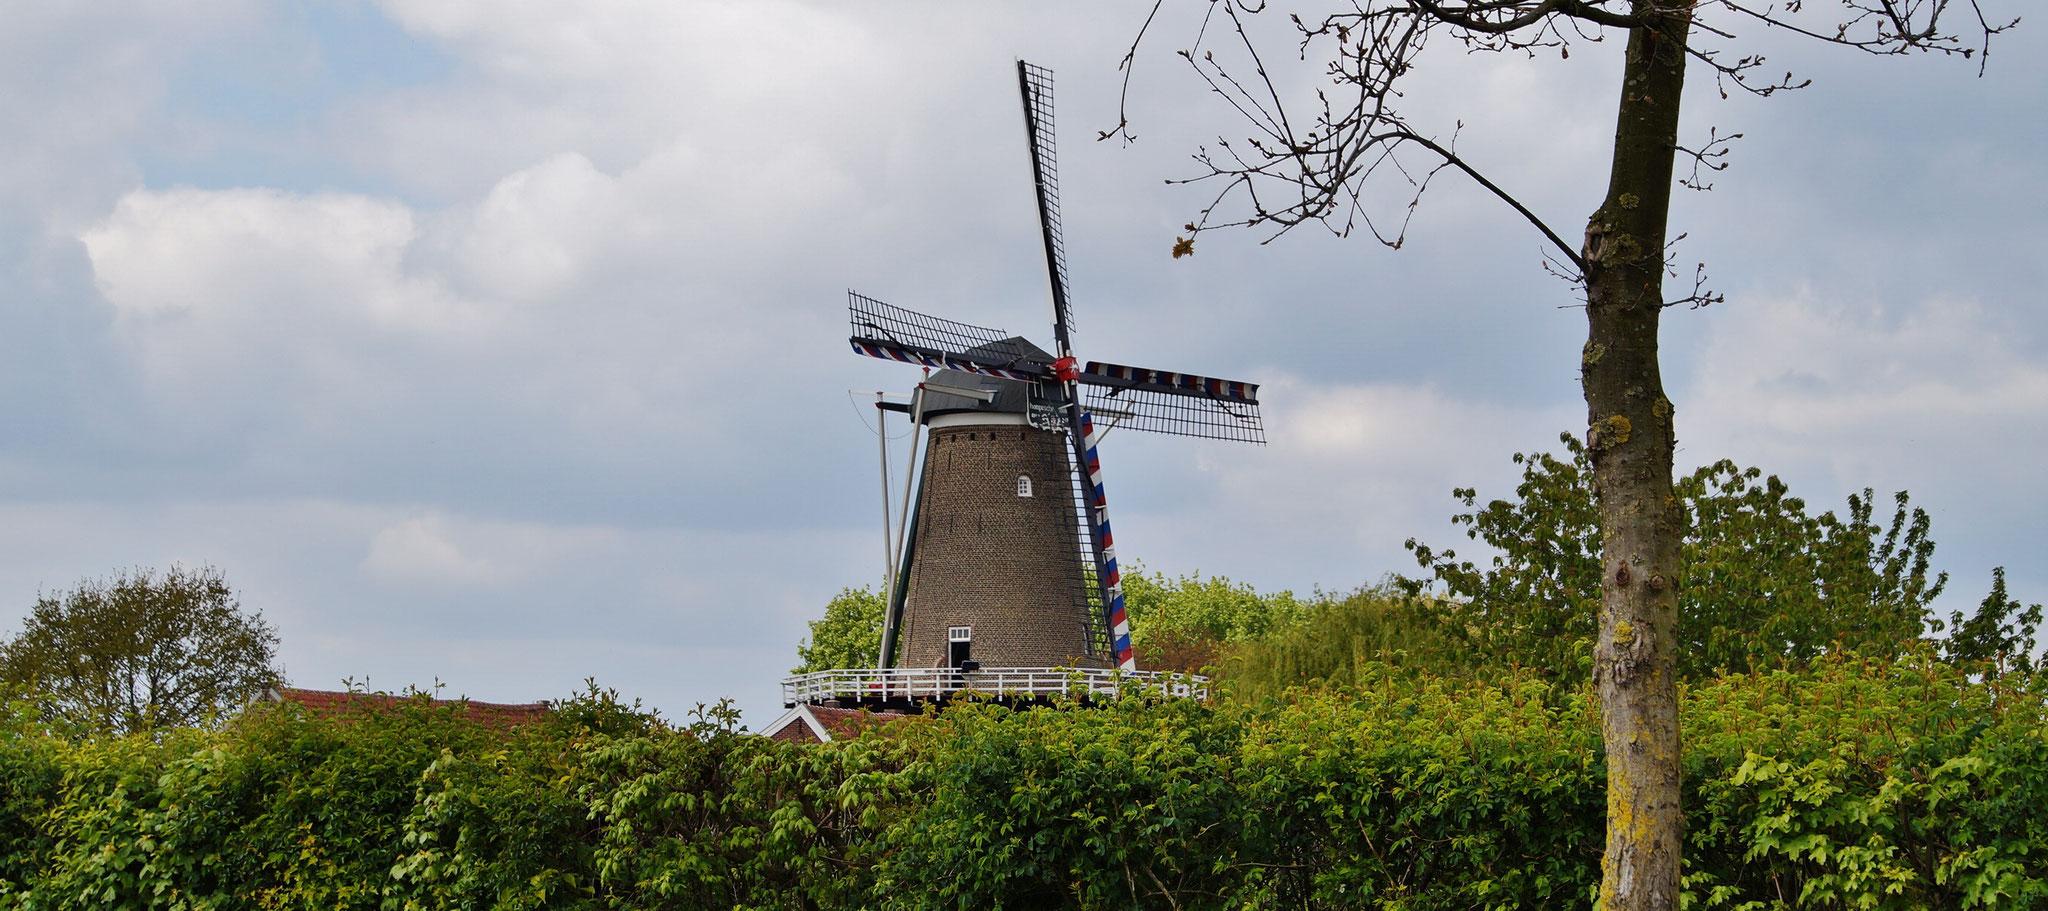 Windmühle vor Stevensweert